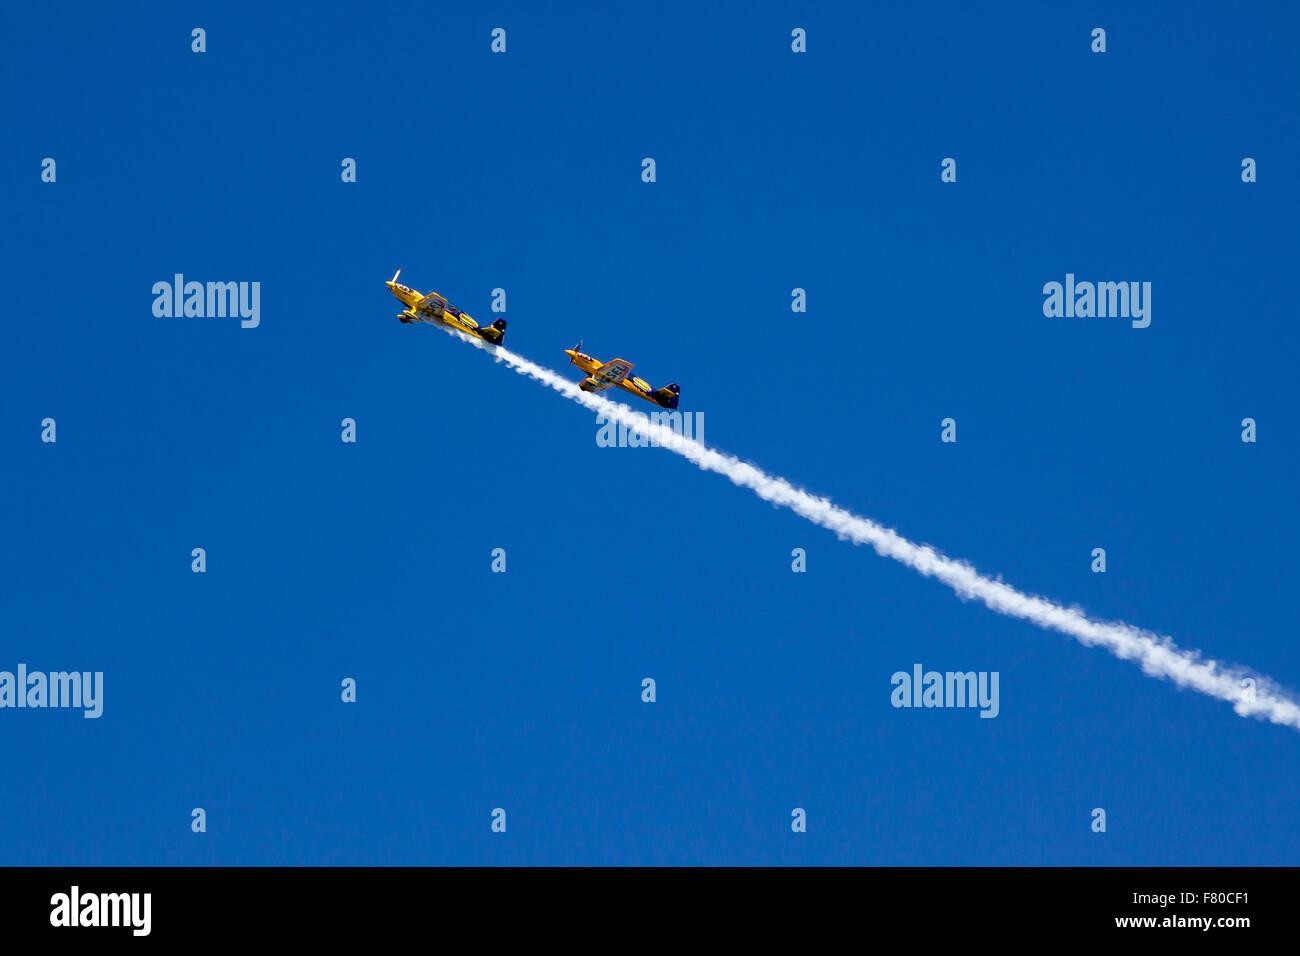 Aerobatic plane in action. - Stock Image